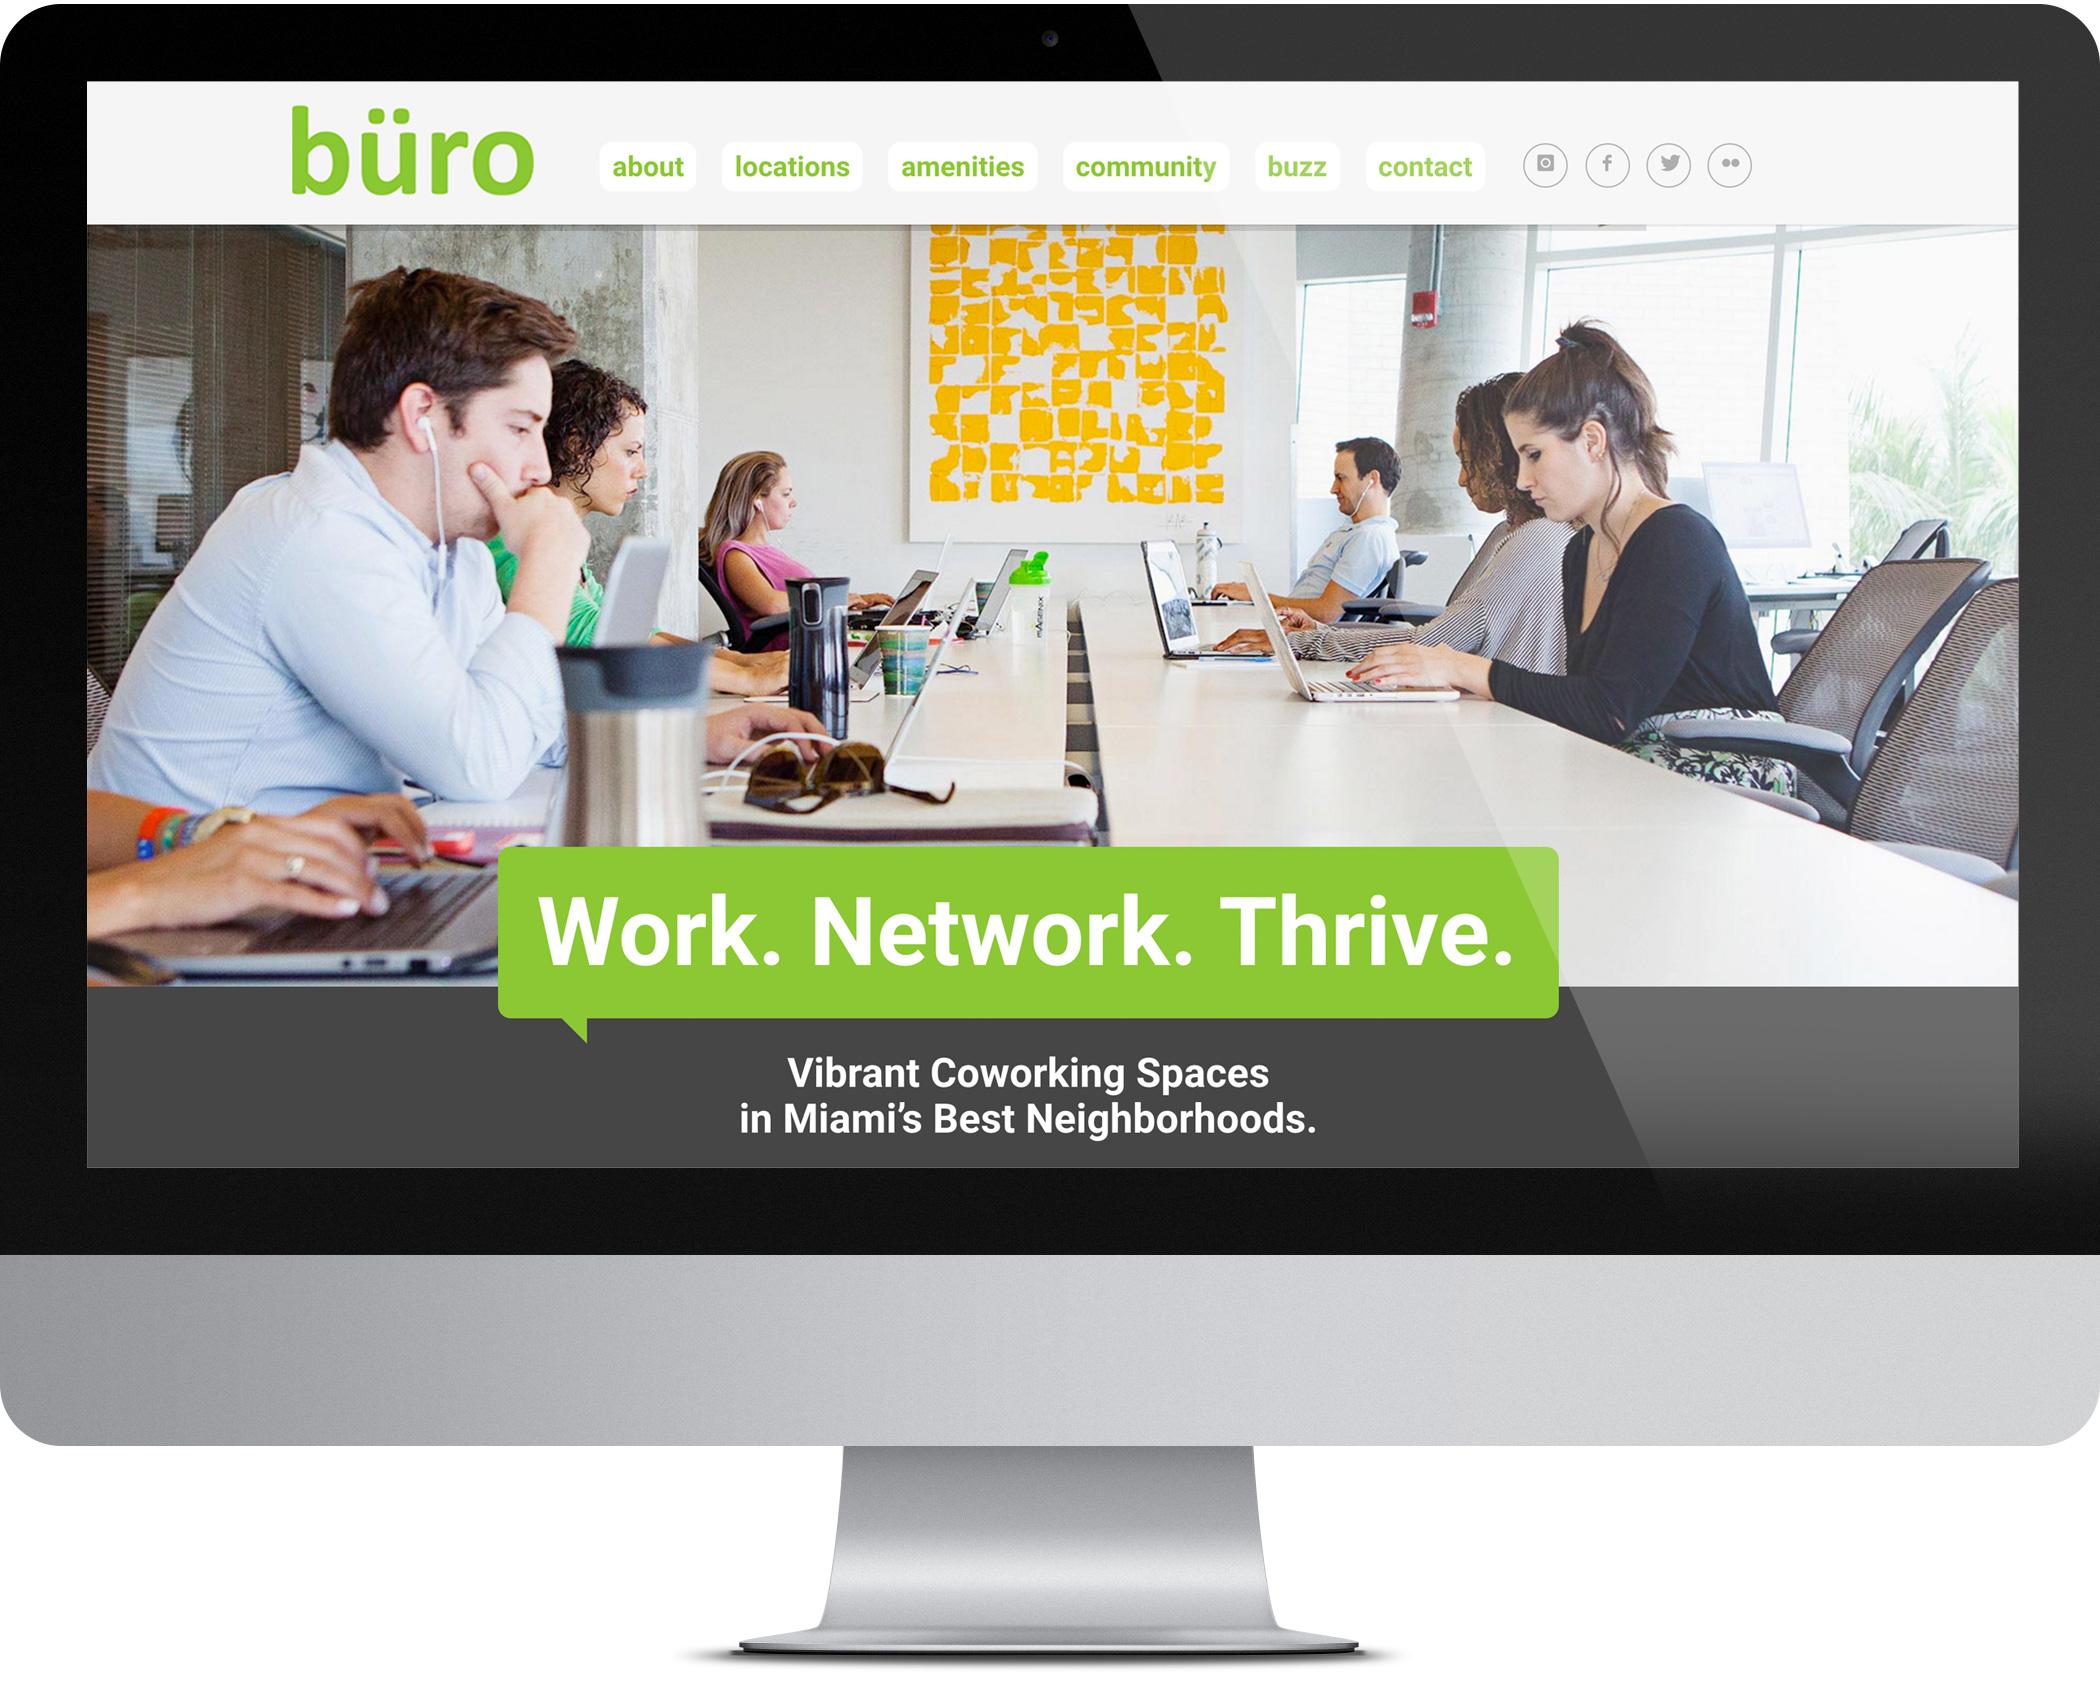 buro-web-desktop.jpg